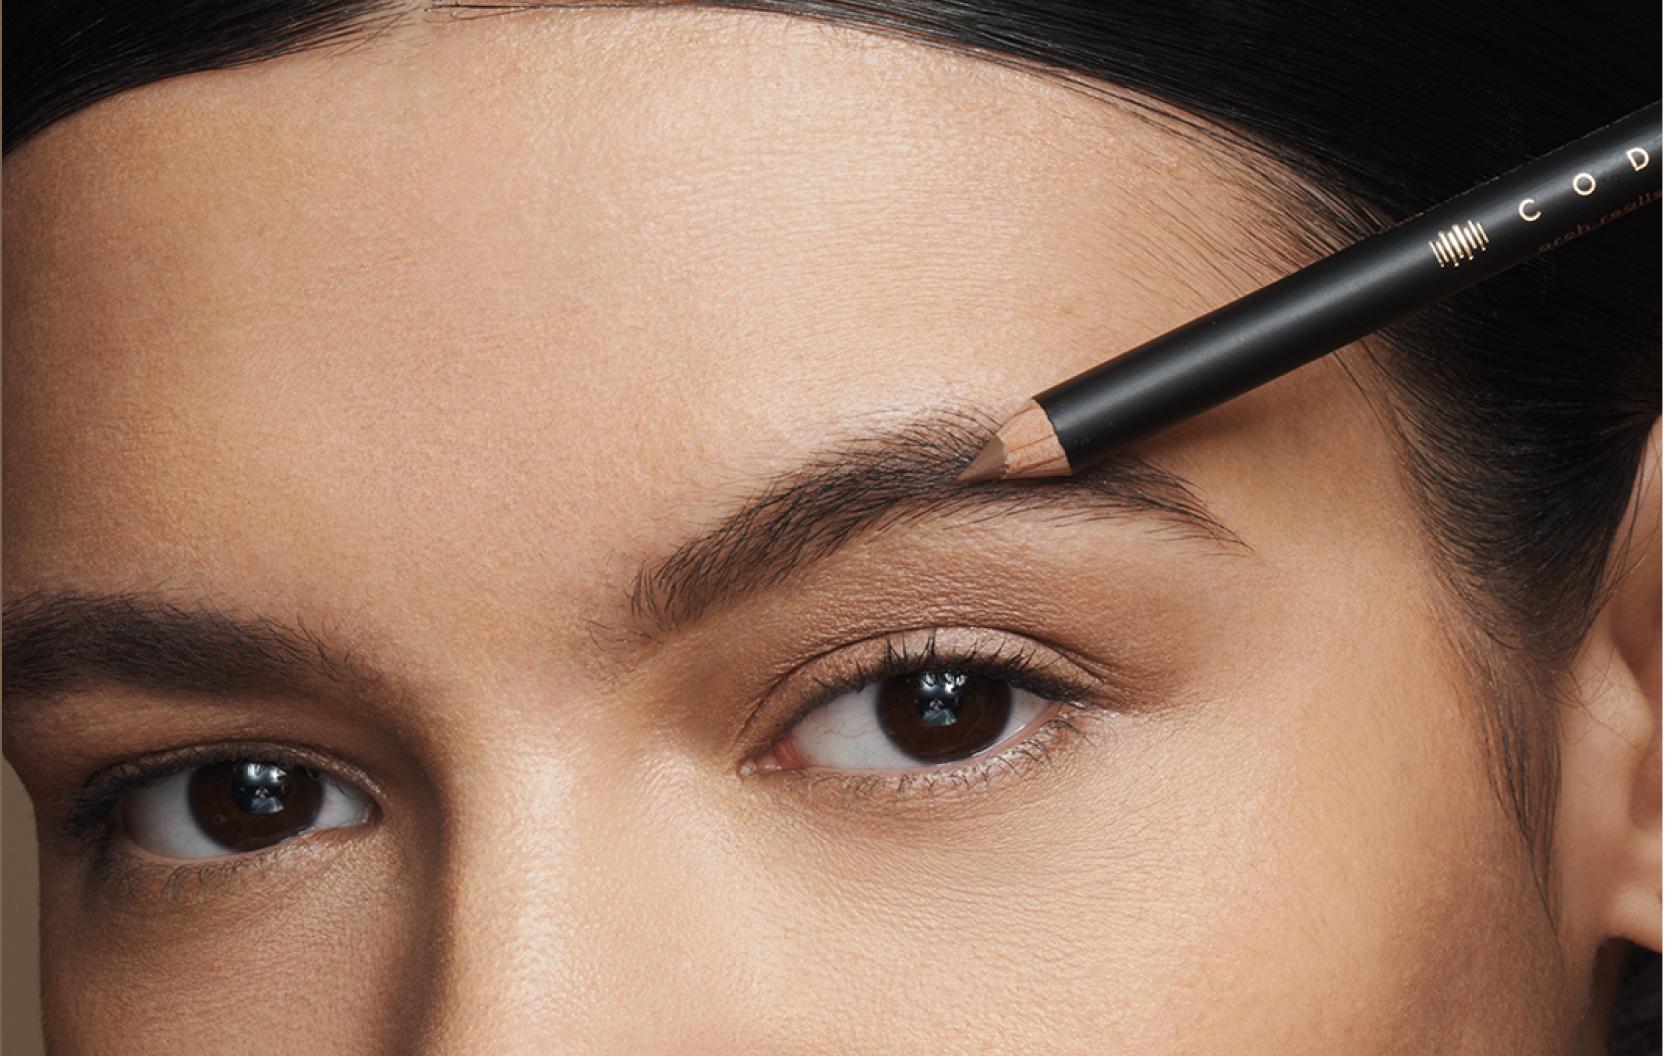 How to grow naturally fuller eyebrows